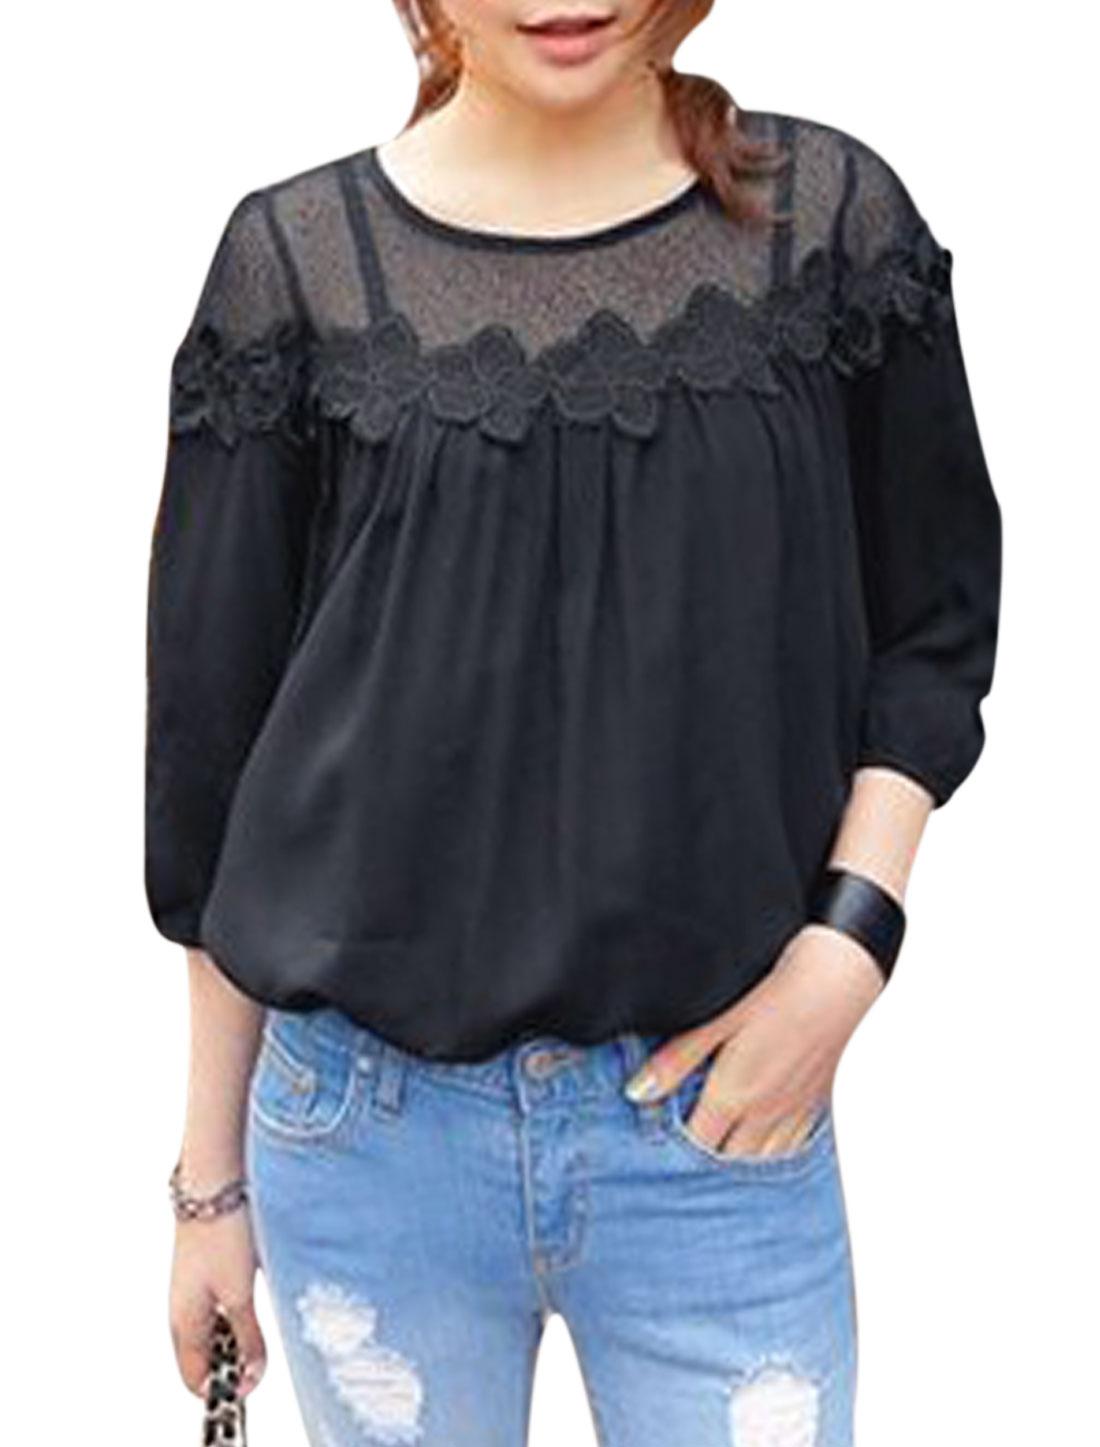 Woman Mesh Panel Crochet Design 3/4 Sleeves Round Neck Top Black S